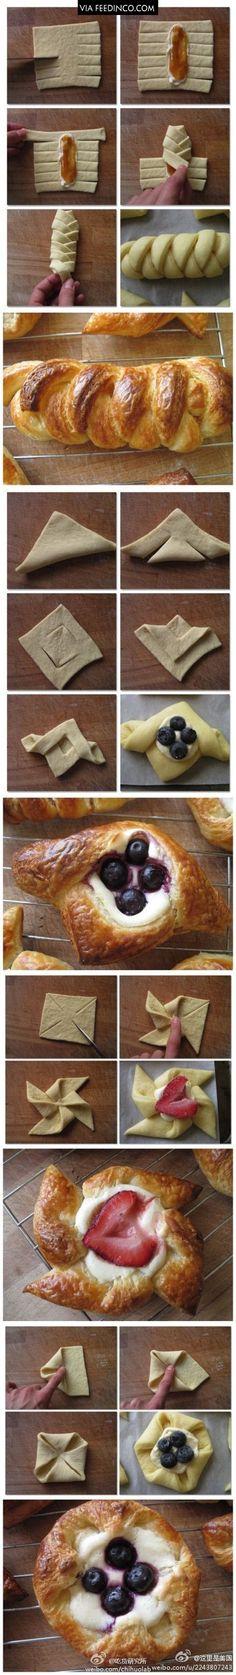 Pastry folding 101 >>> check similar images on Feedinco.com